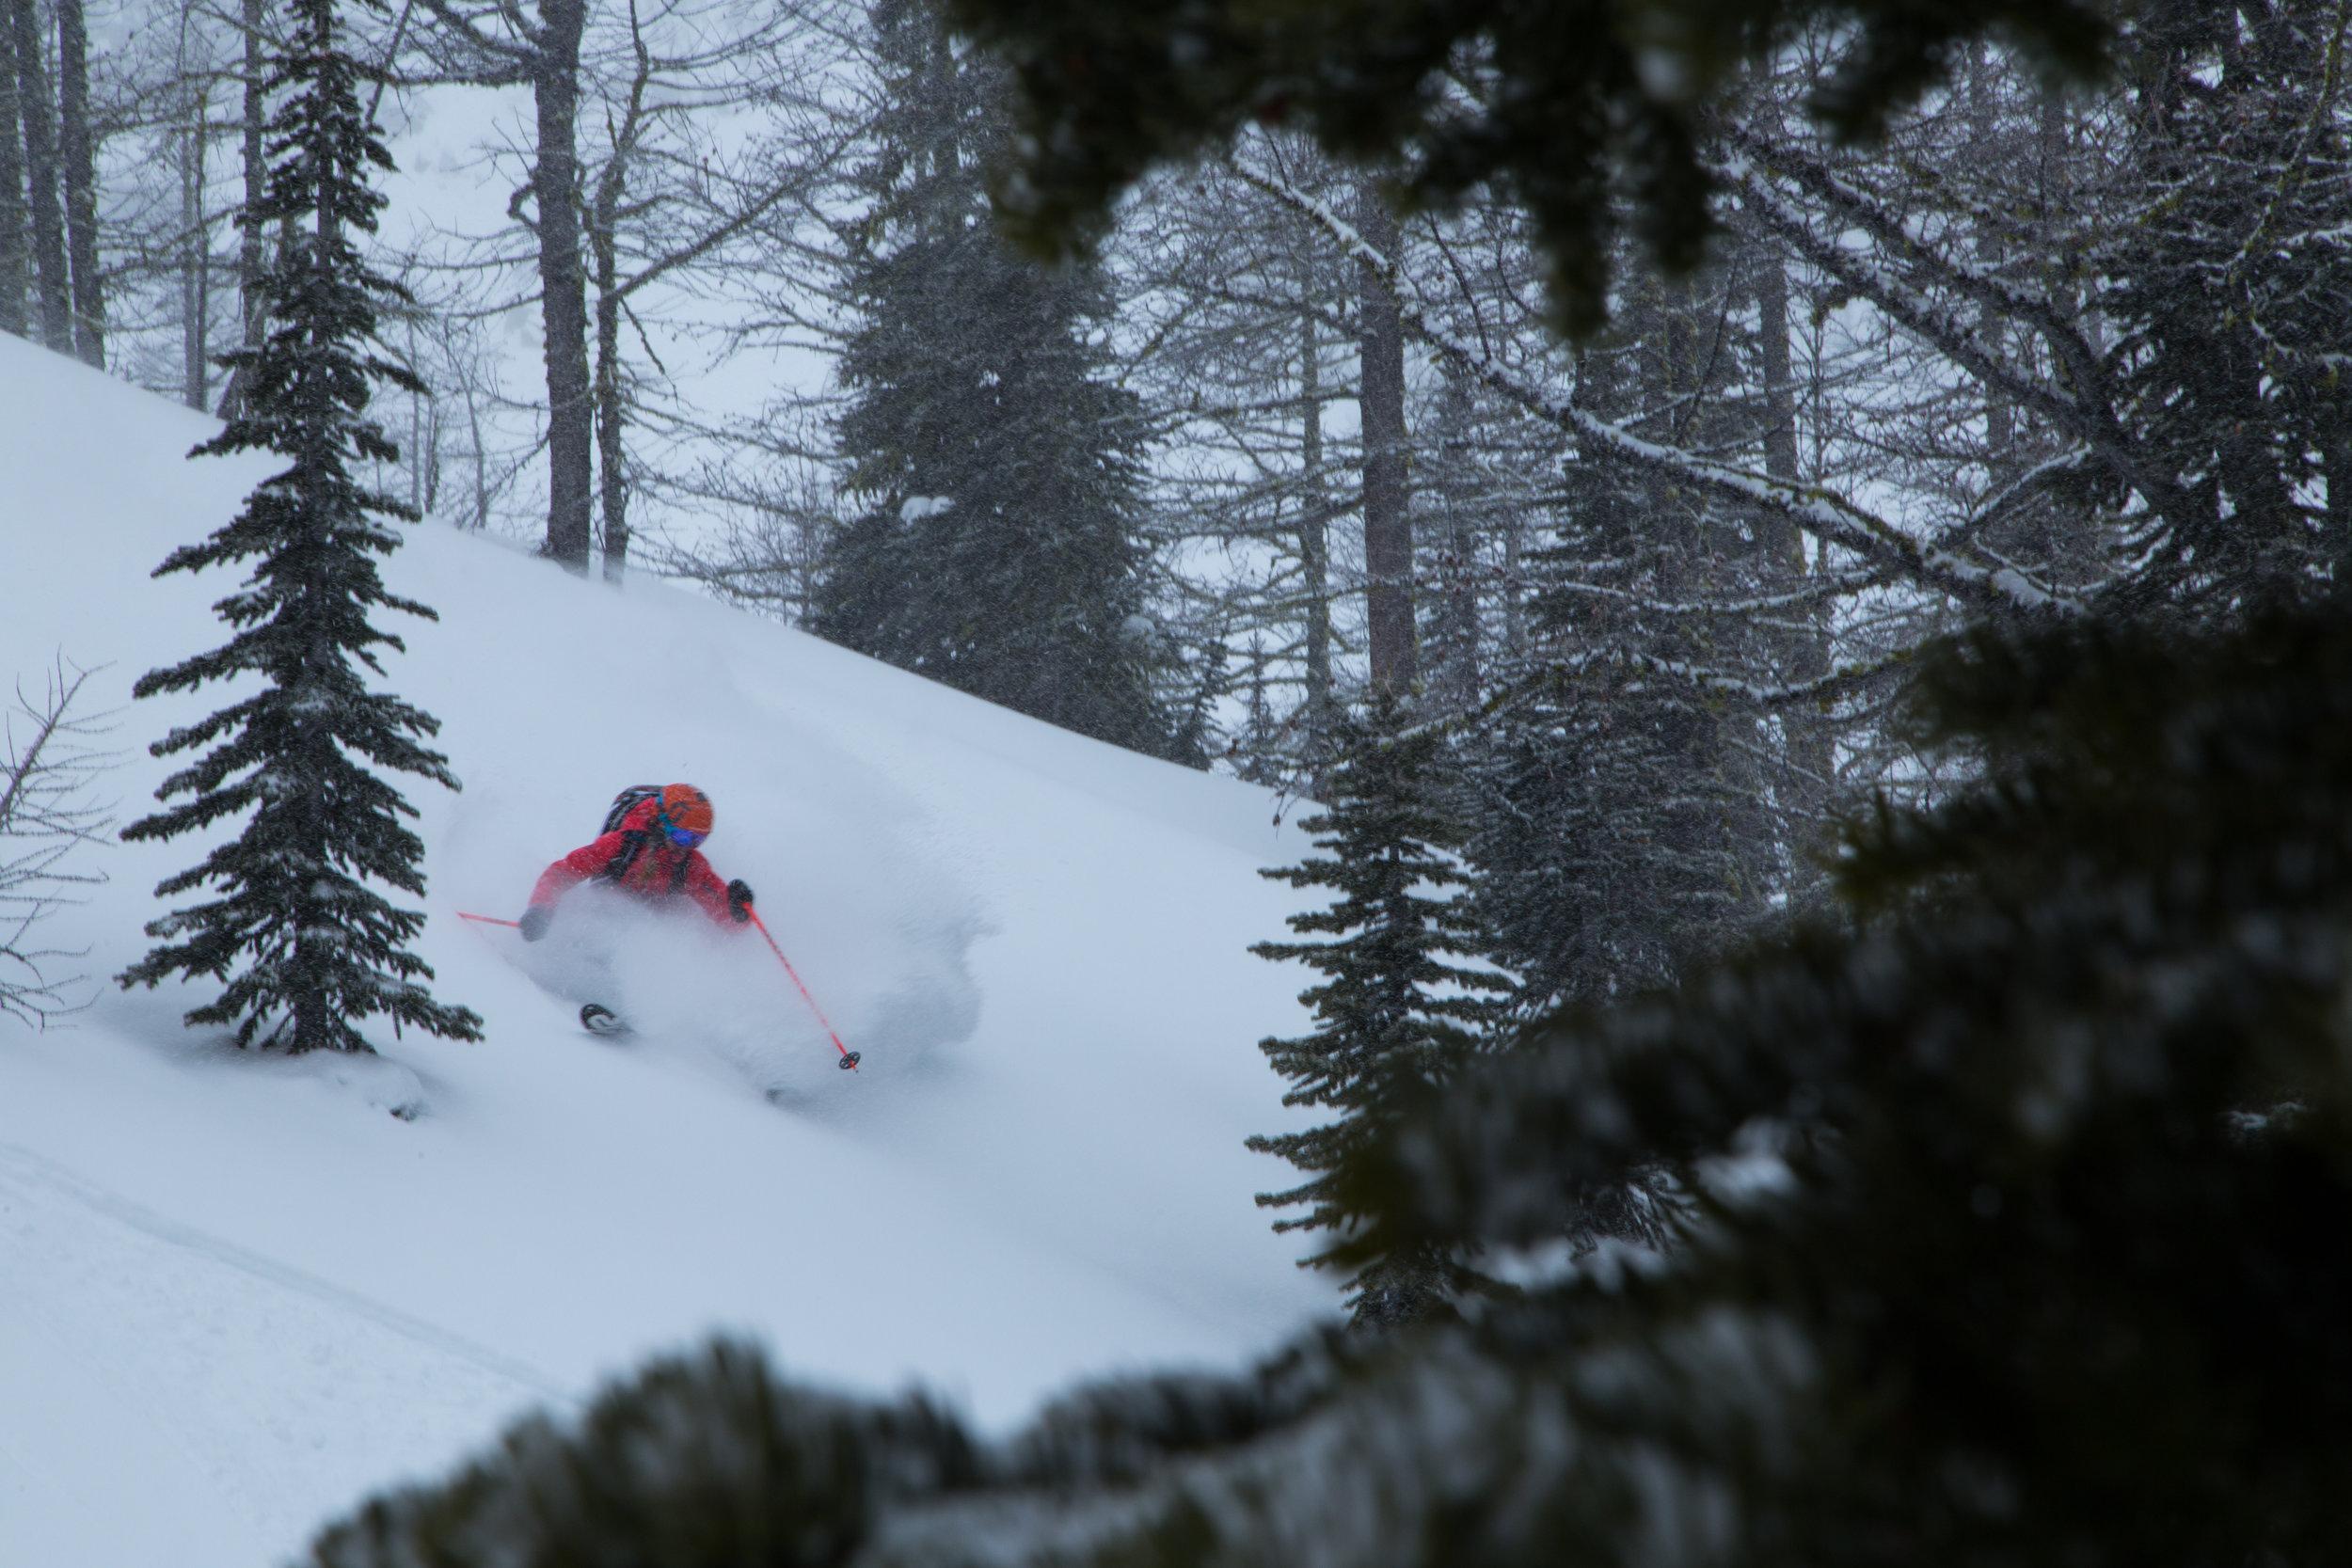 boulder-hut-skiing.jpg